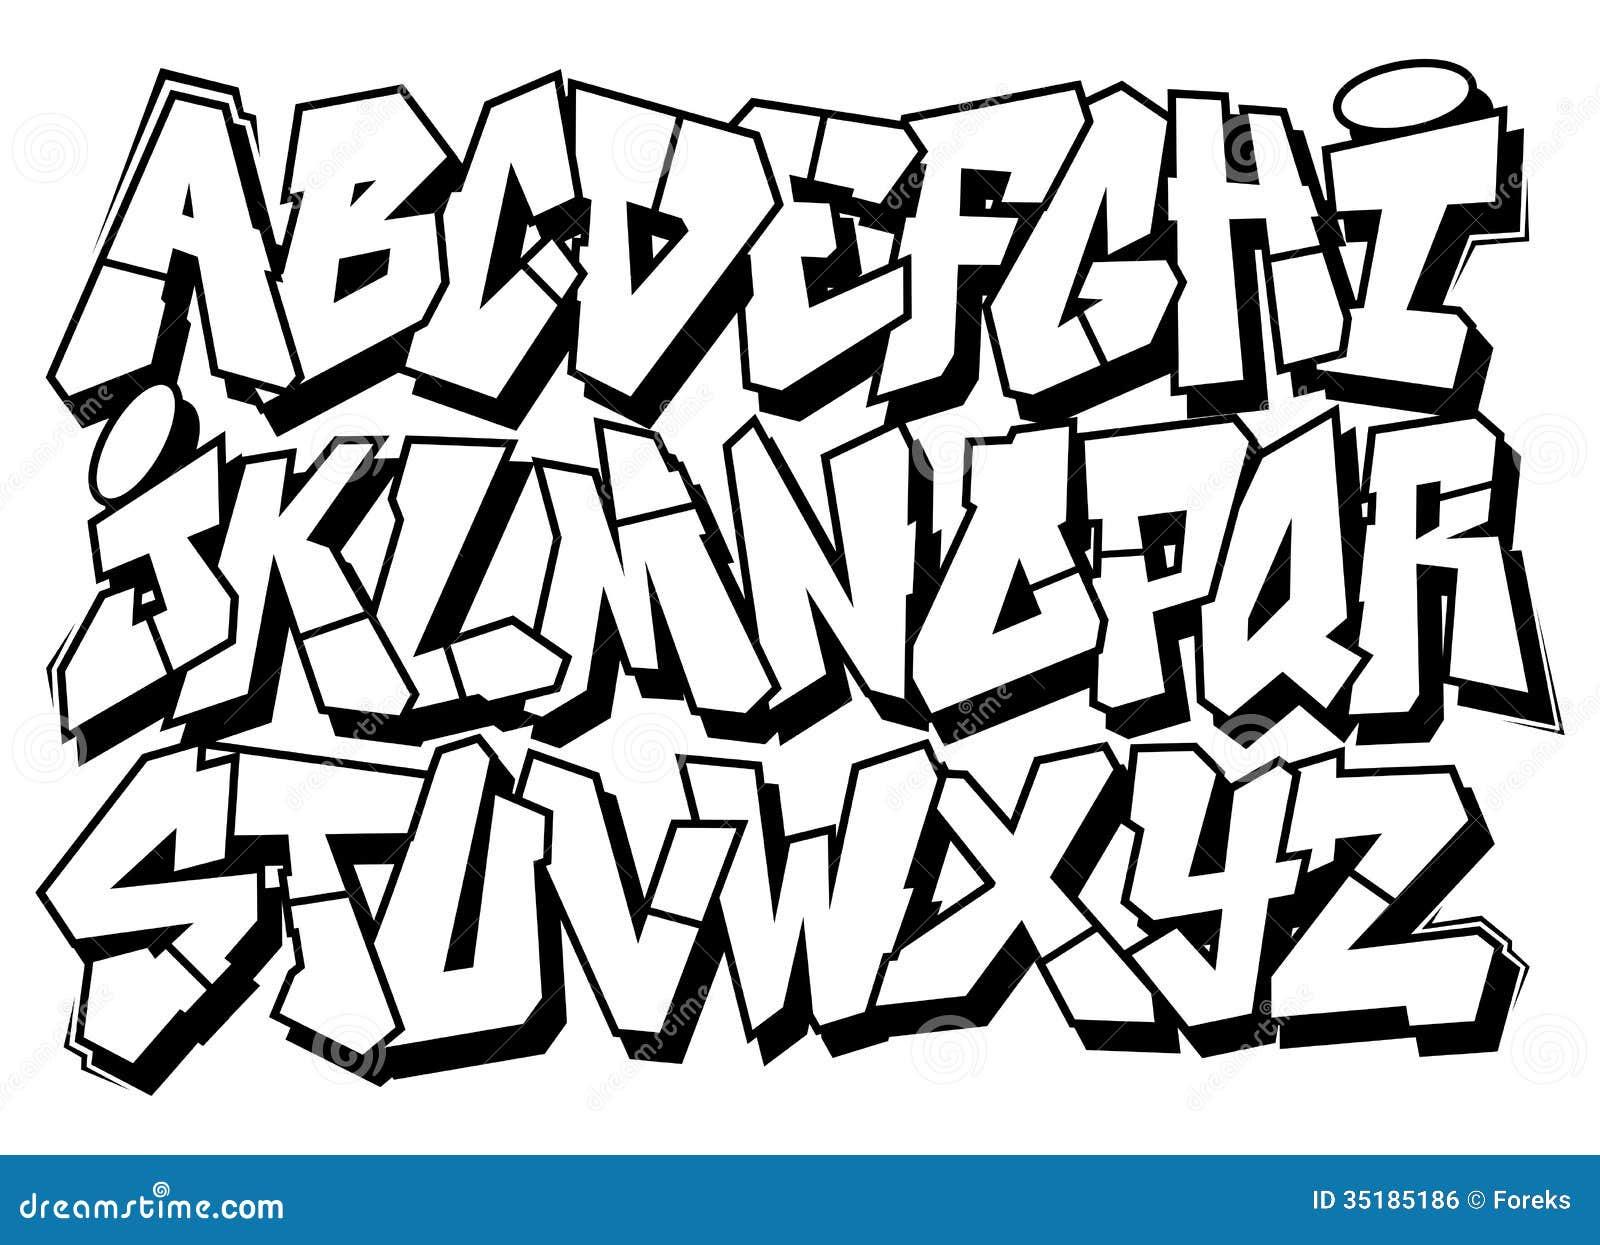 Unduh 67+ Gambar Grafiti A-Z Terbaik Gratis